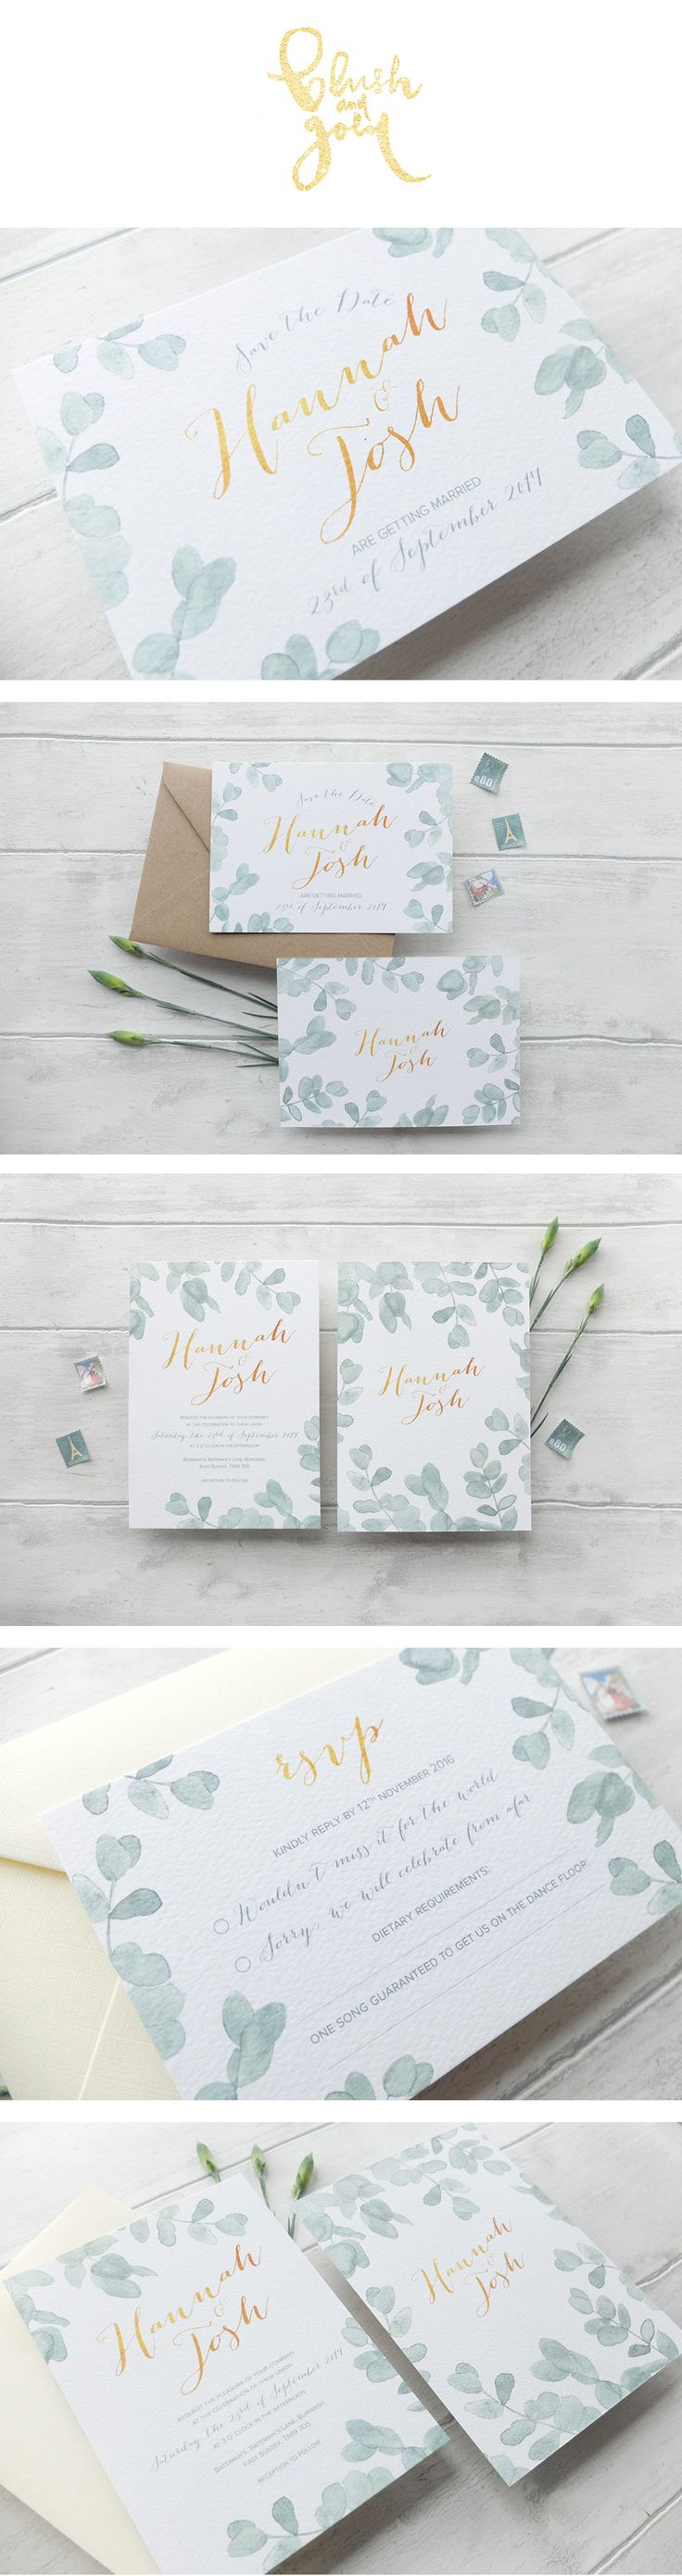 Eucalyptus watercolour wedding invitation suite Elegant and